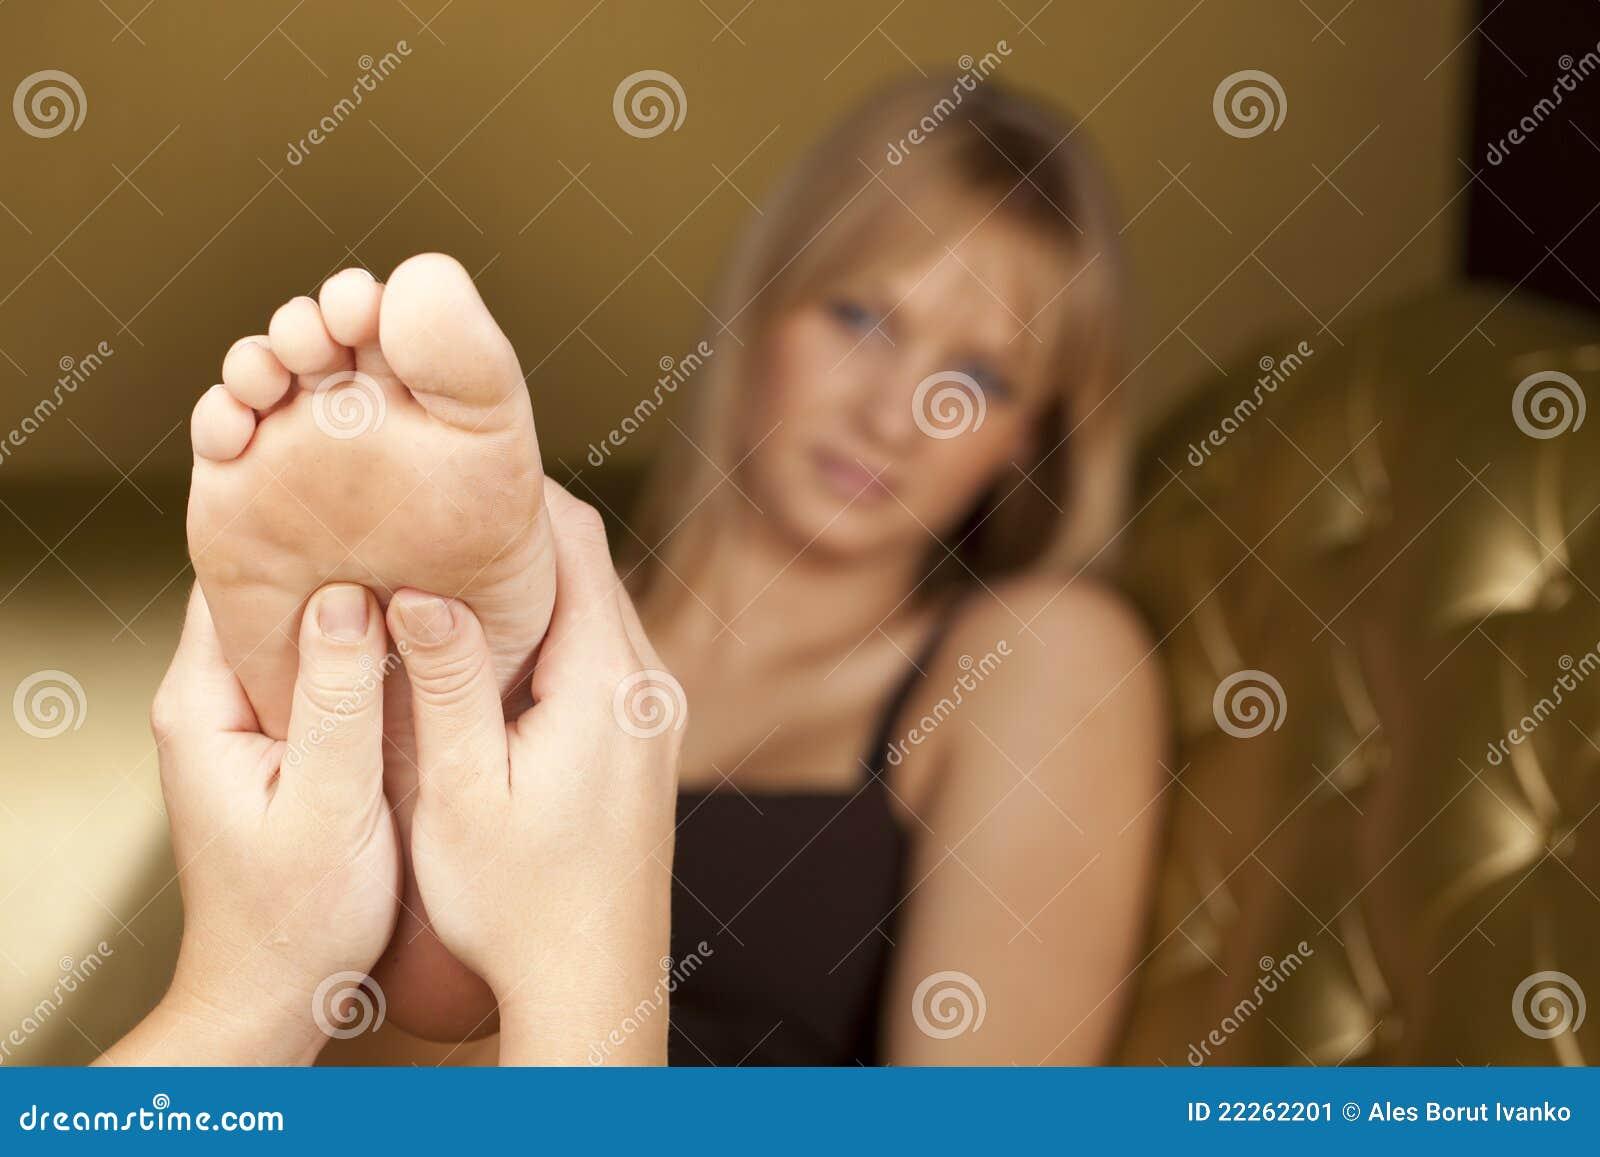 Top 5 des massages prfrs des filles - amb-croatiefr